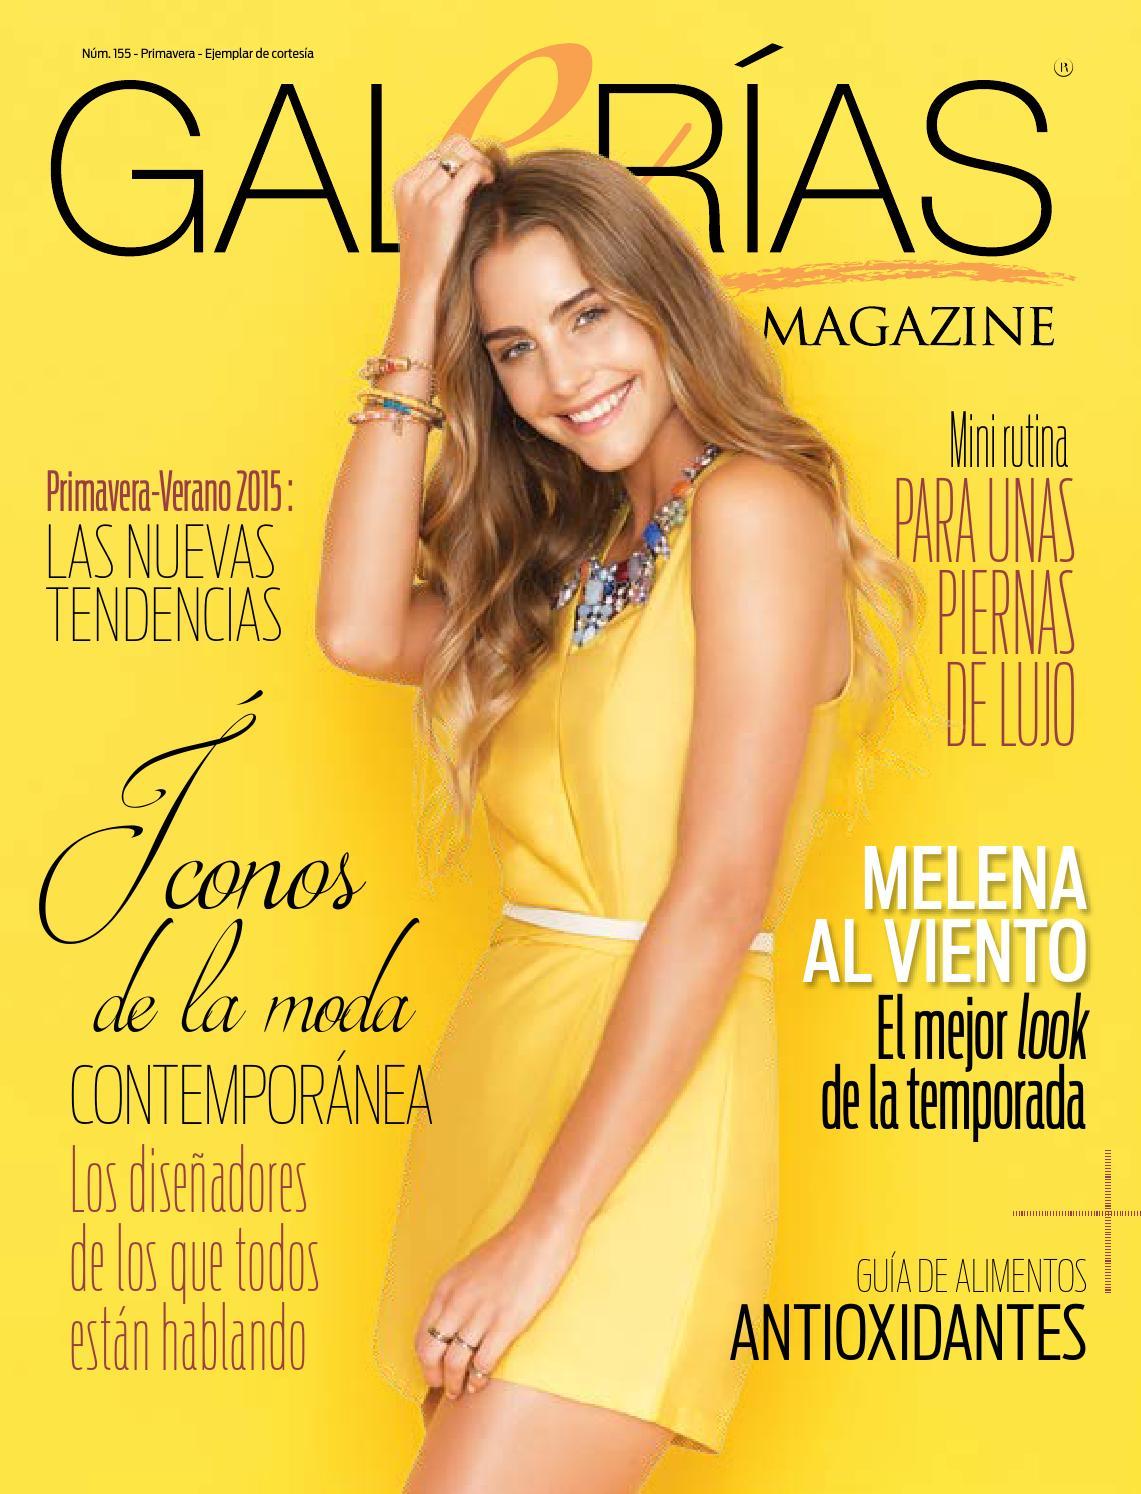 727ffd50b16e Gm 155 Primavera 2015 by Galerías Magazine - issuu